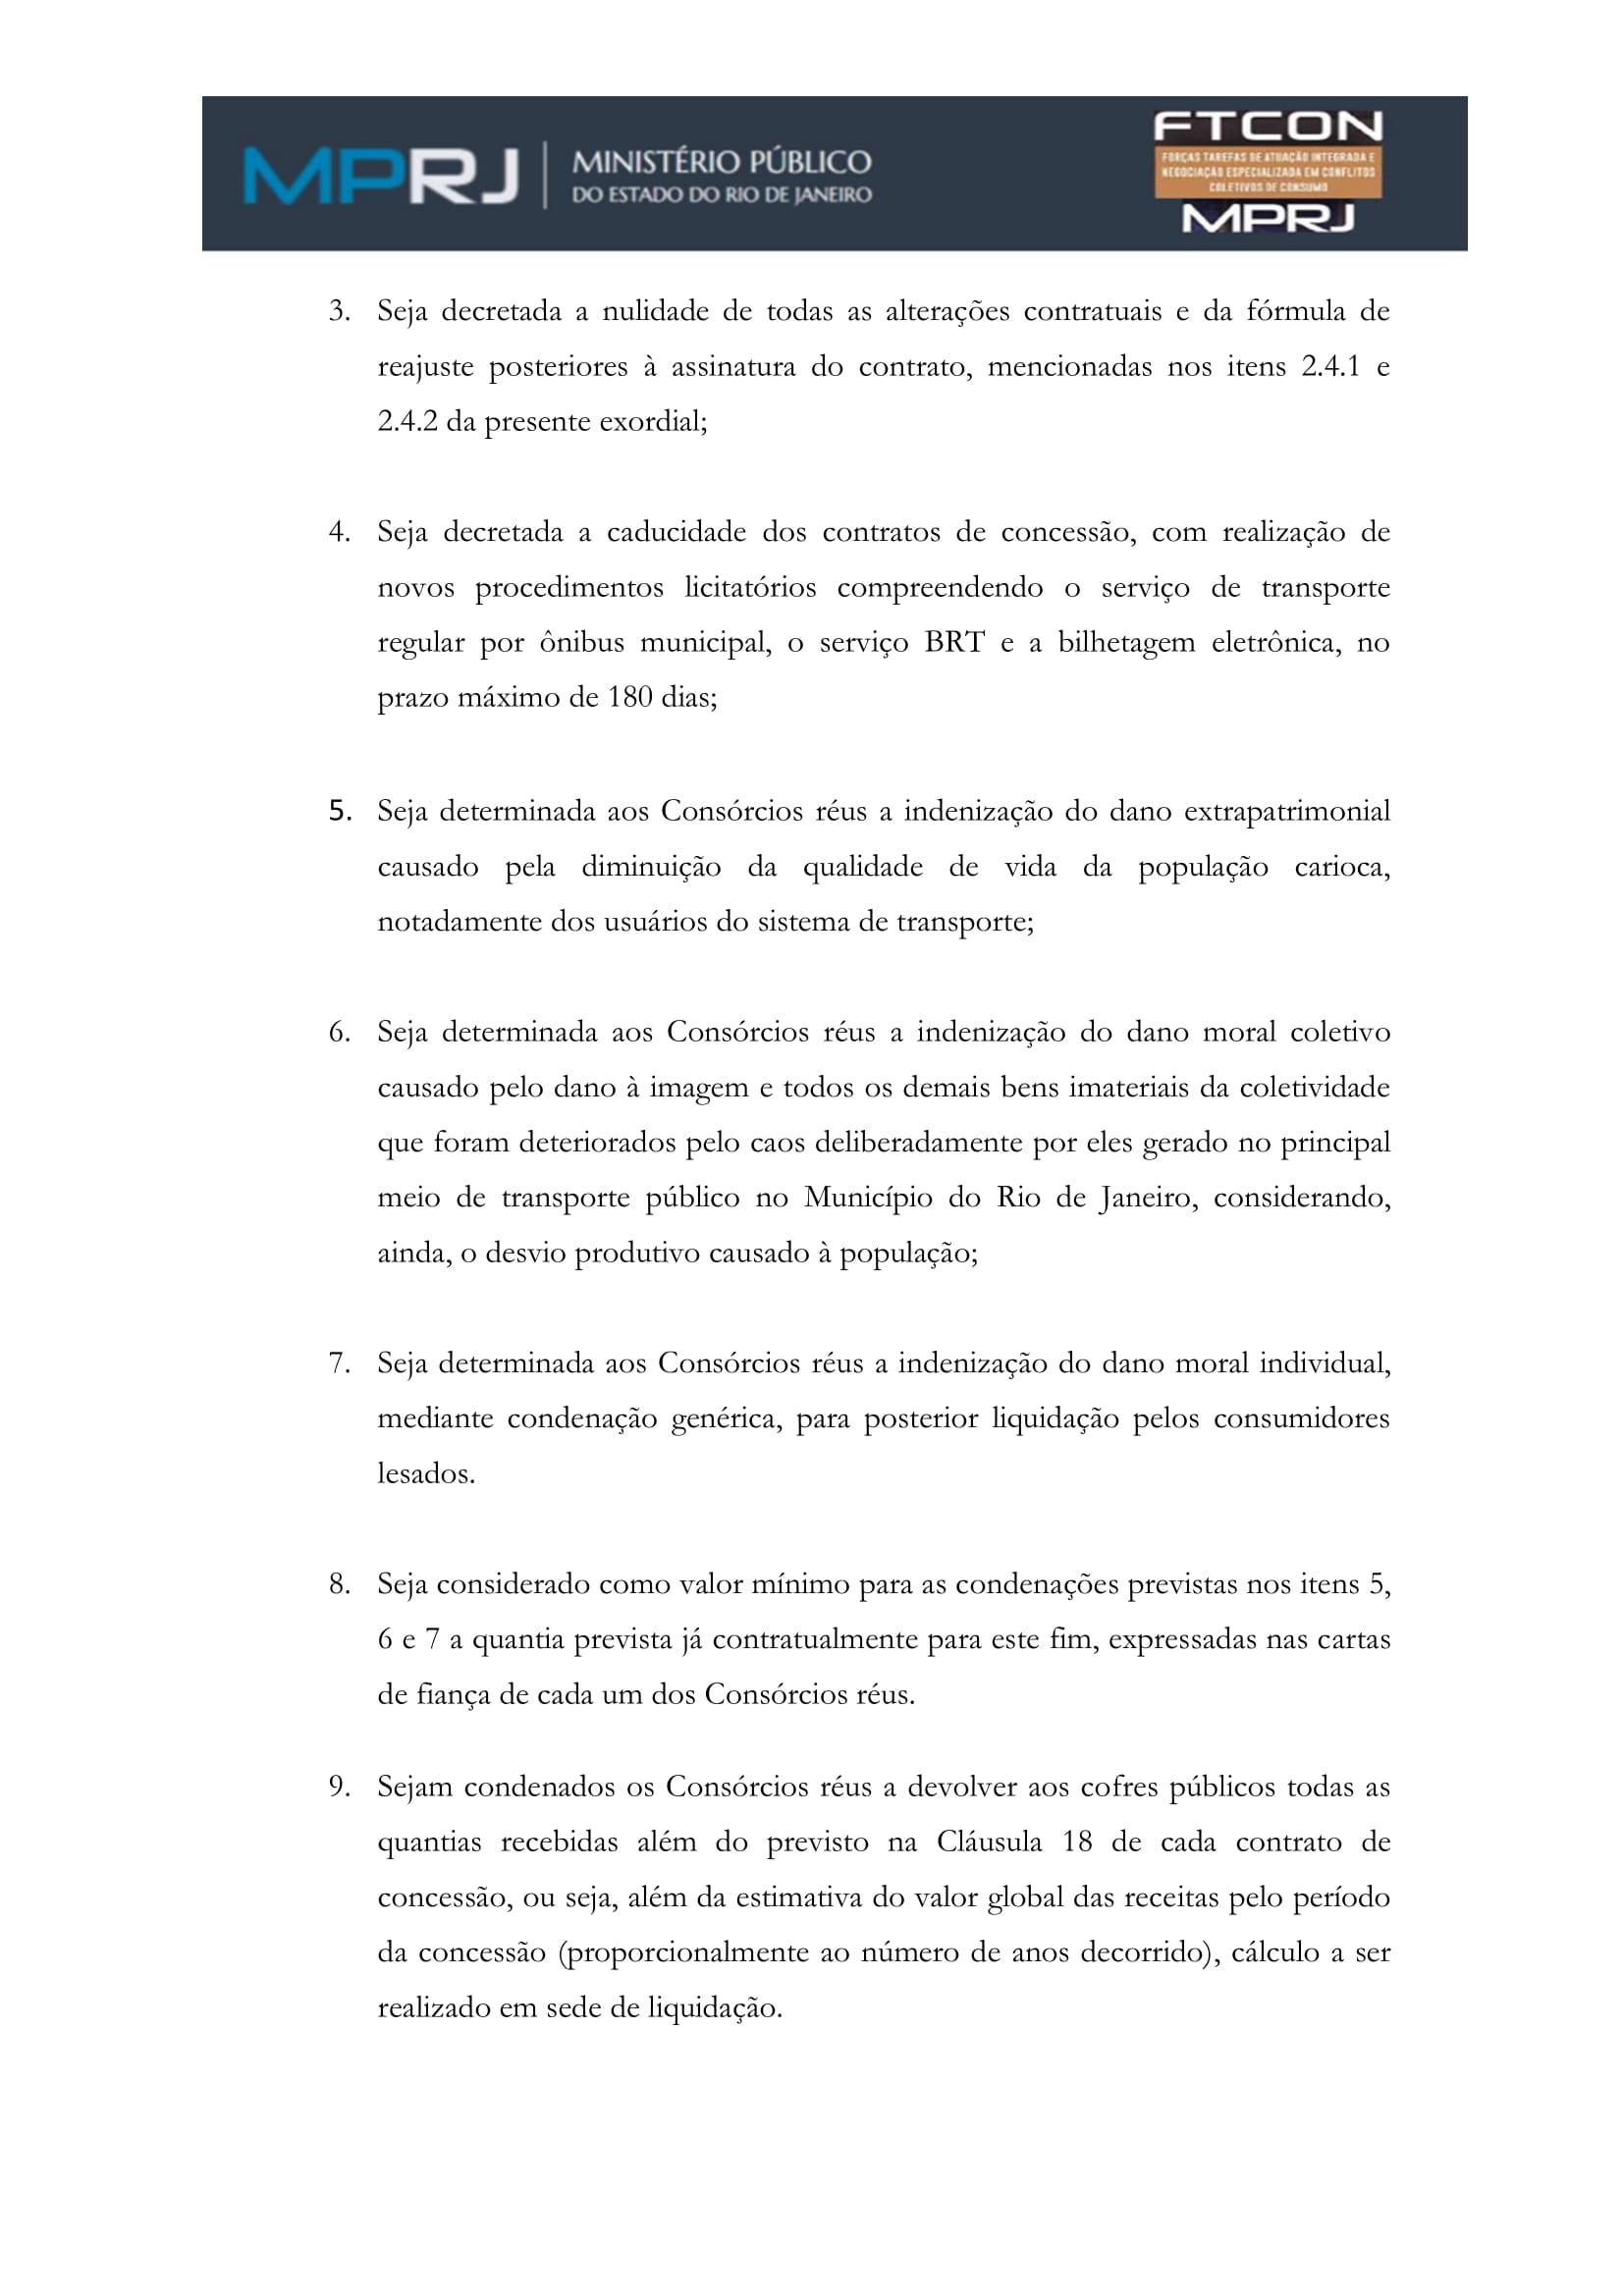 acp_caducidade_onibus_dr_rt-137